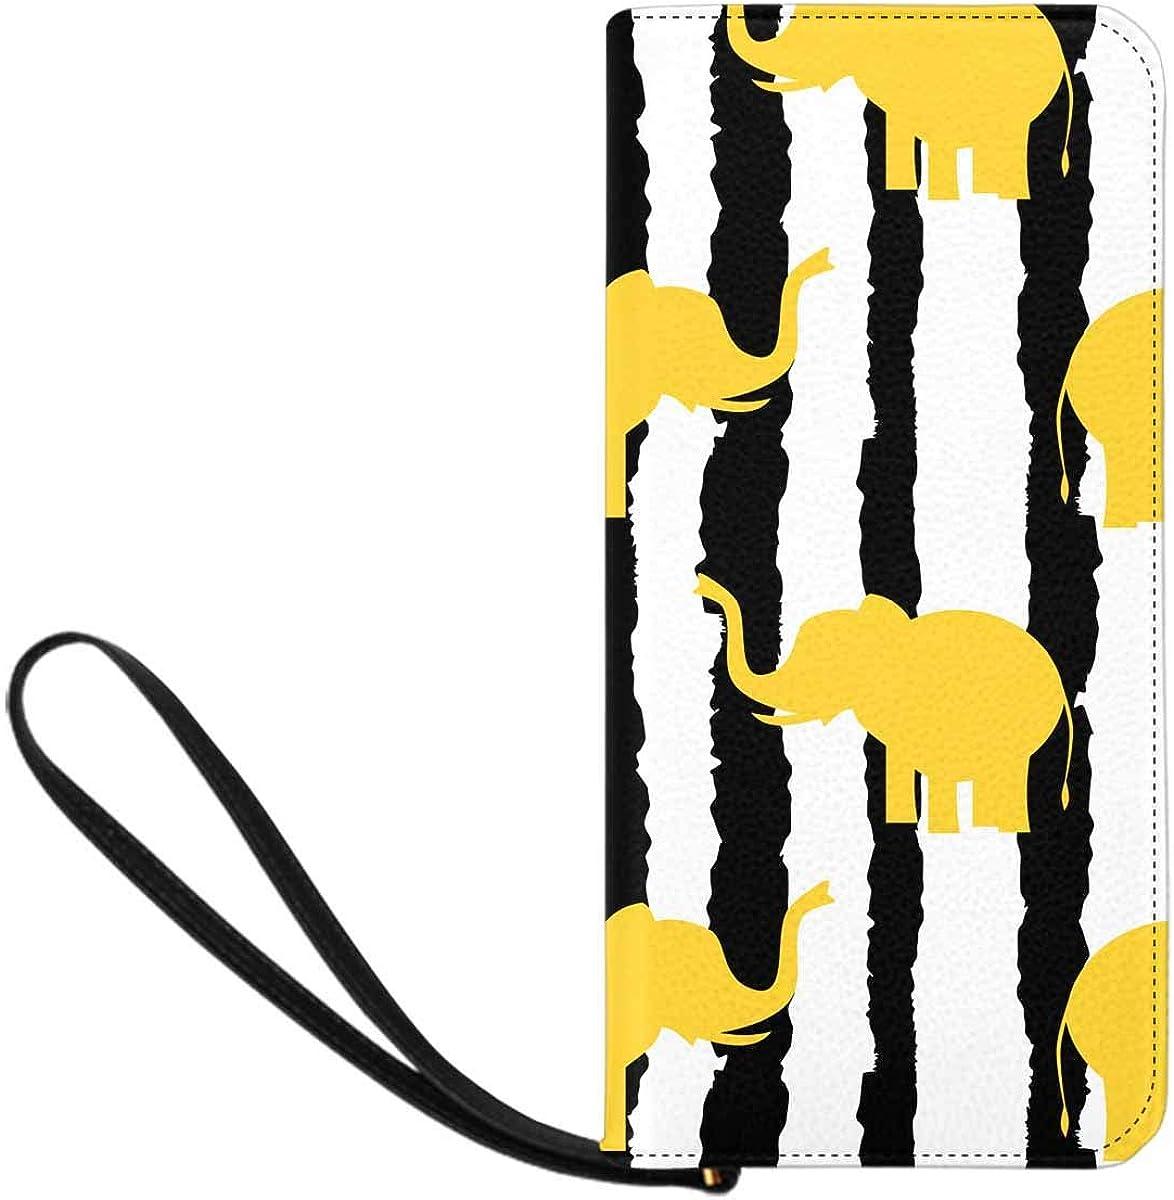 INTERESTPRINT Cute Yellow Elephants Silhouette Credit Card Wallet Clutch Purse, Huge Storage Capacity